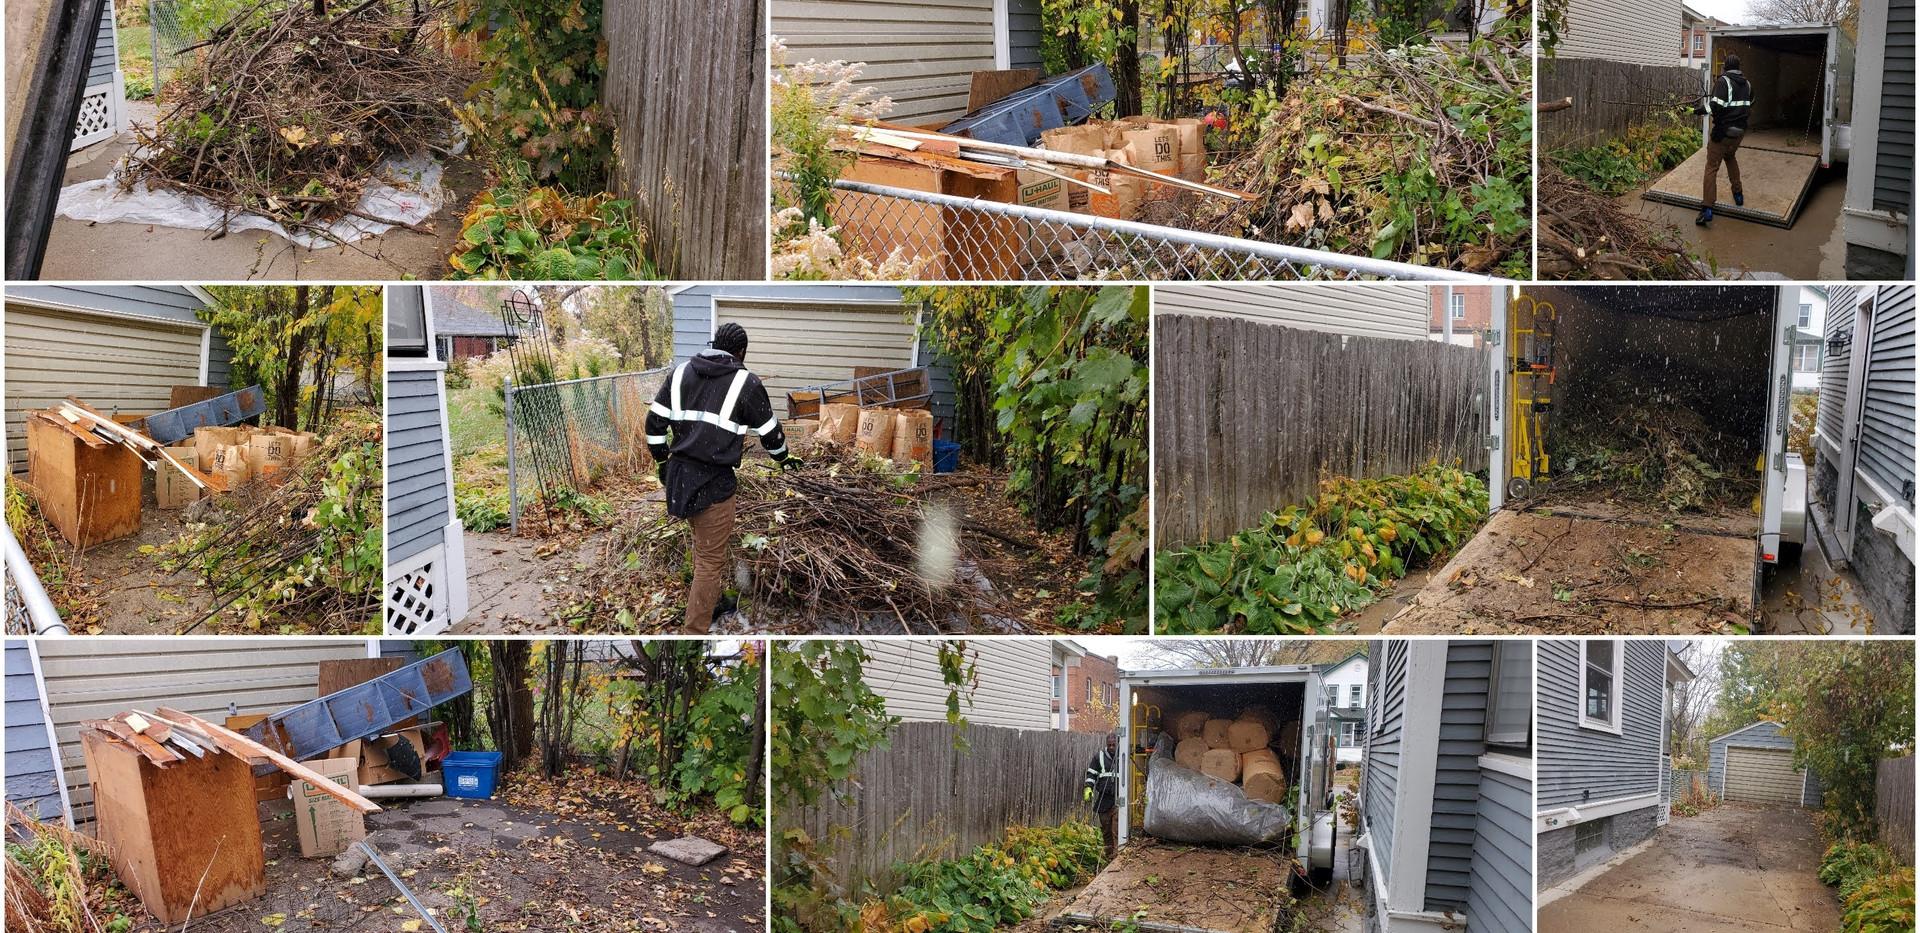 Yard Waste Junk Removal